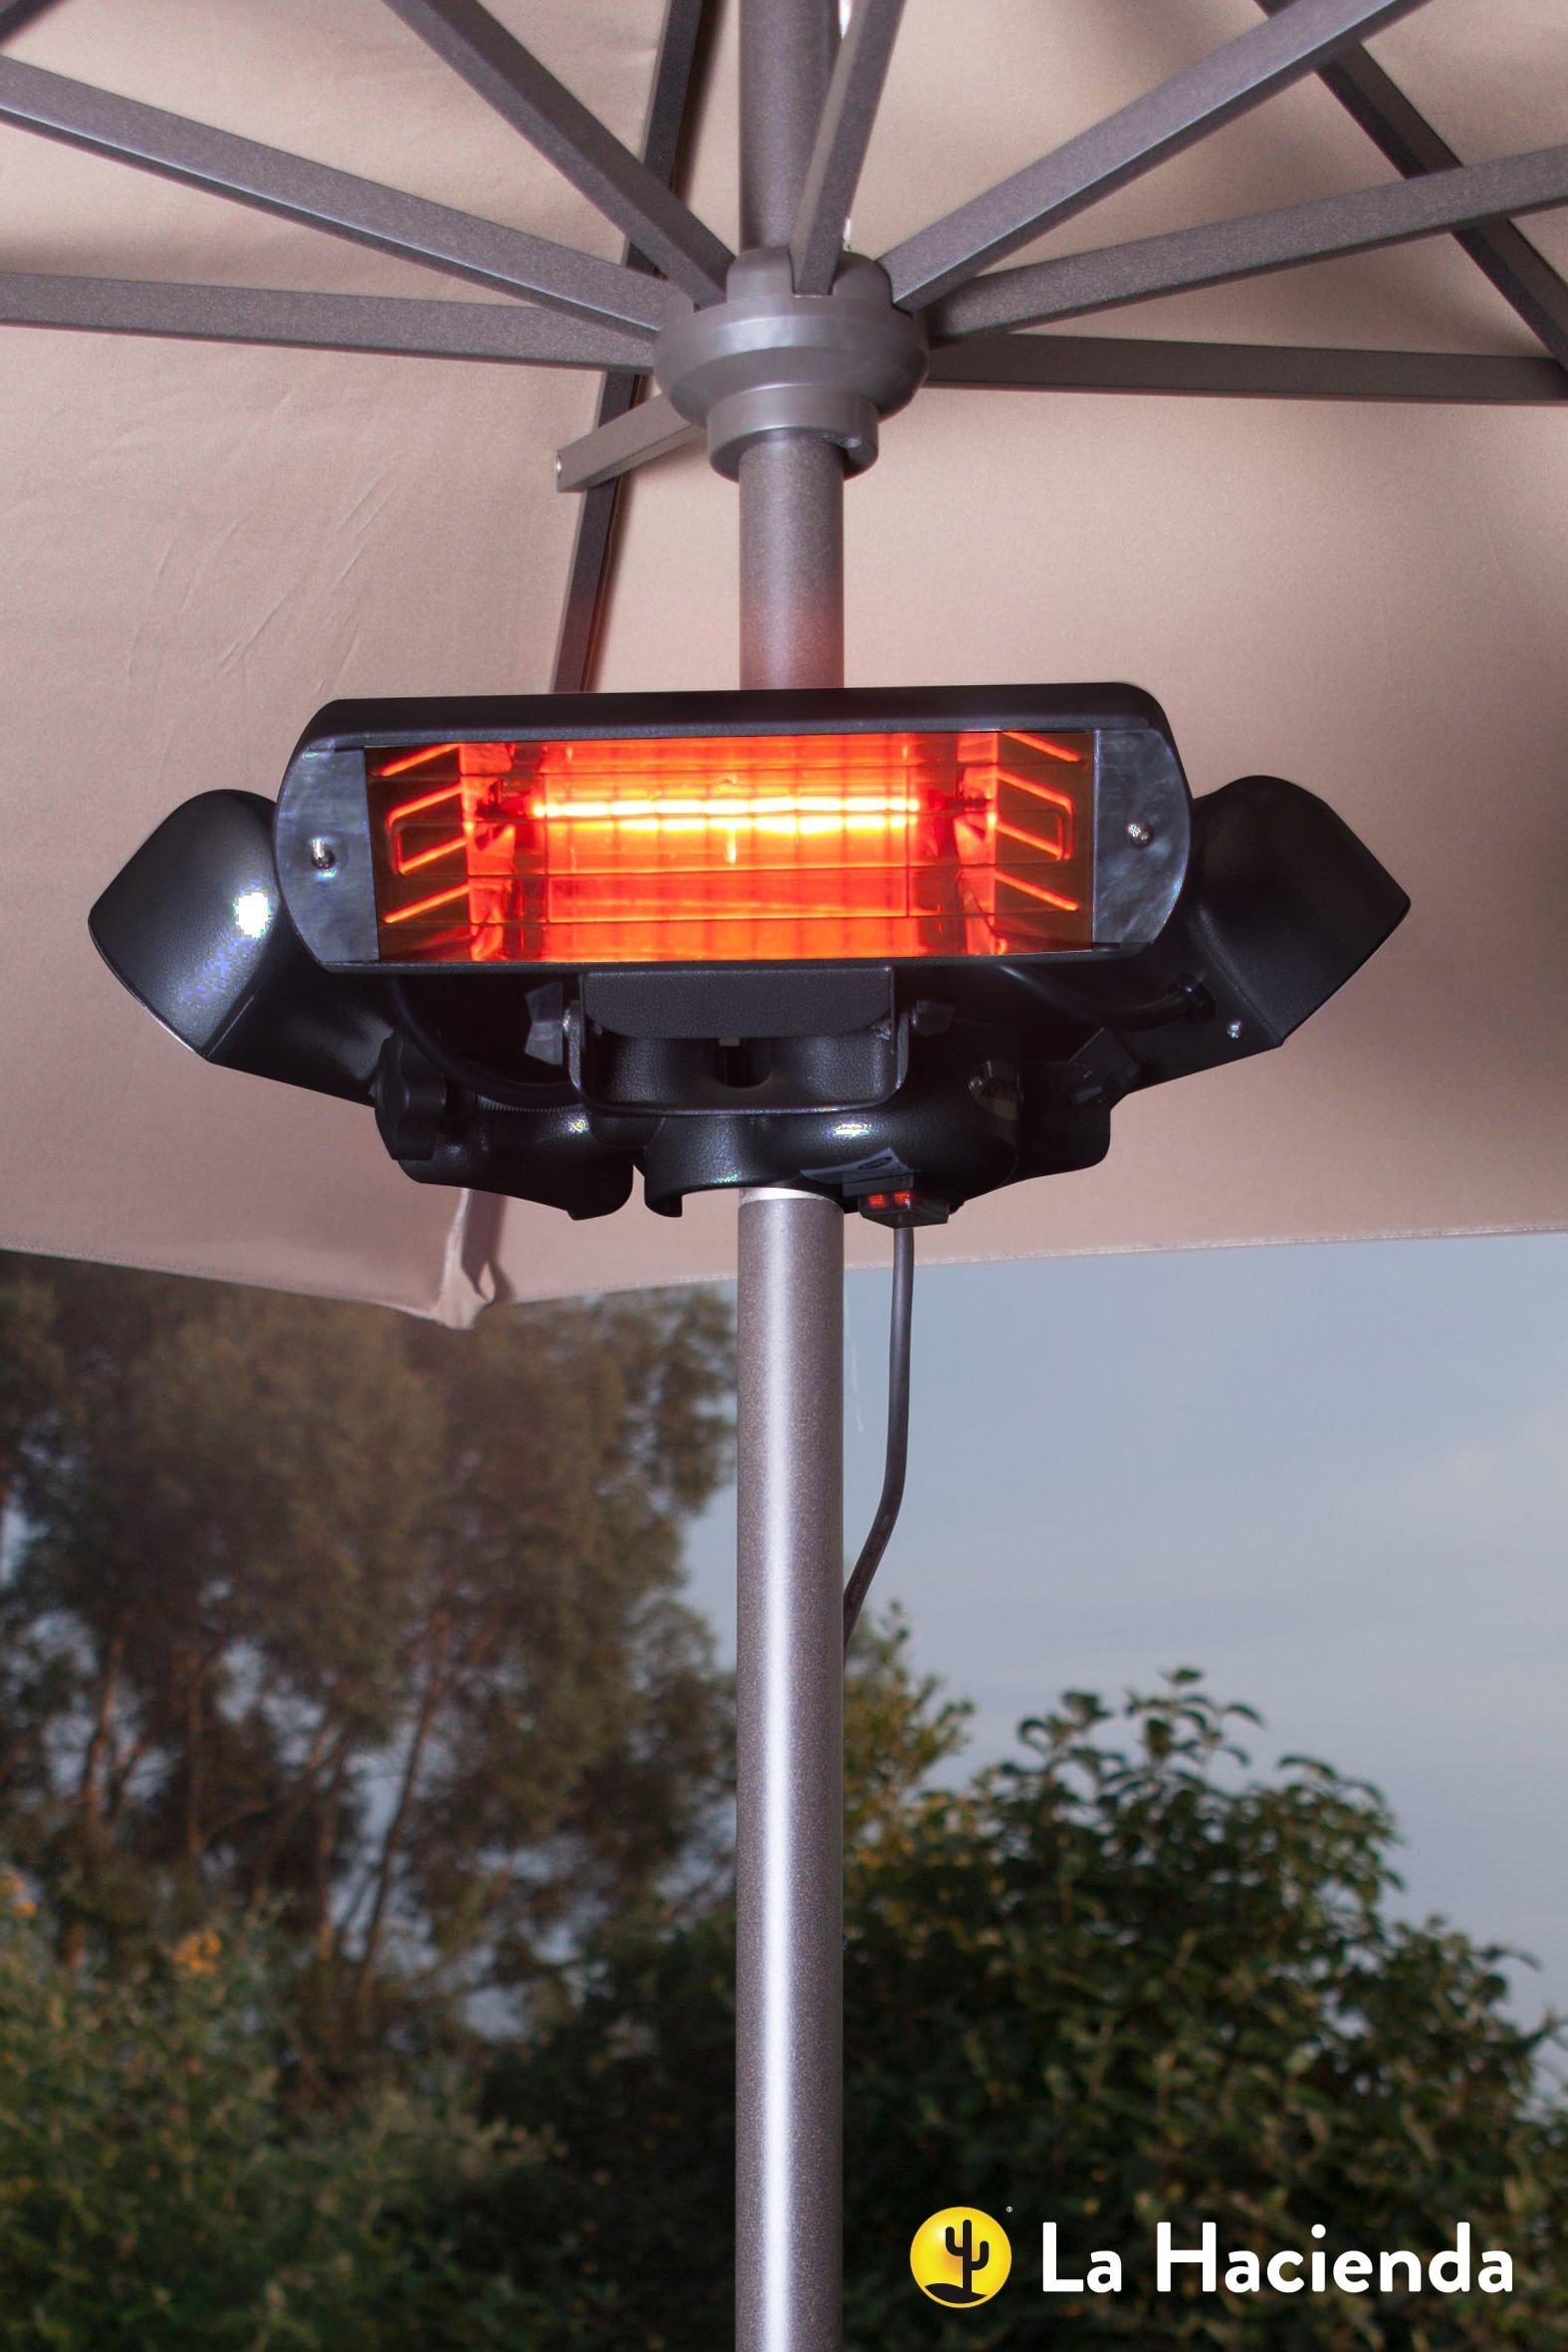 La Hacienda/Heatmaster electric parasol heater U2BSR24